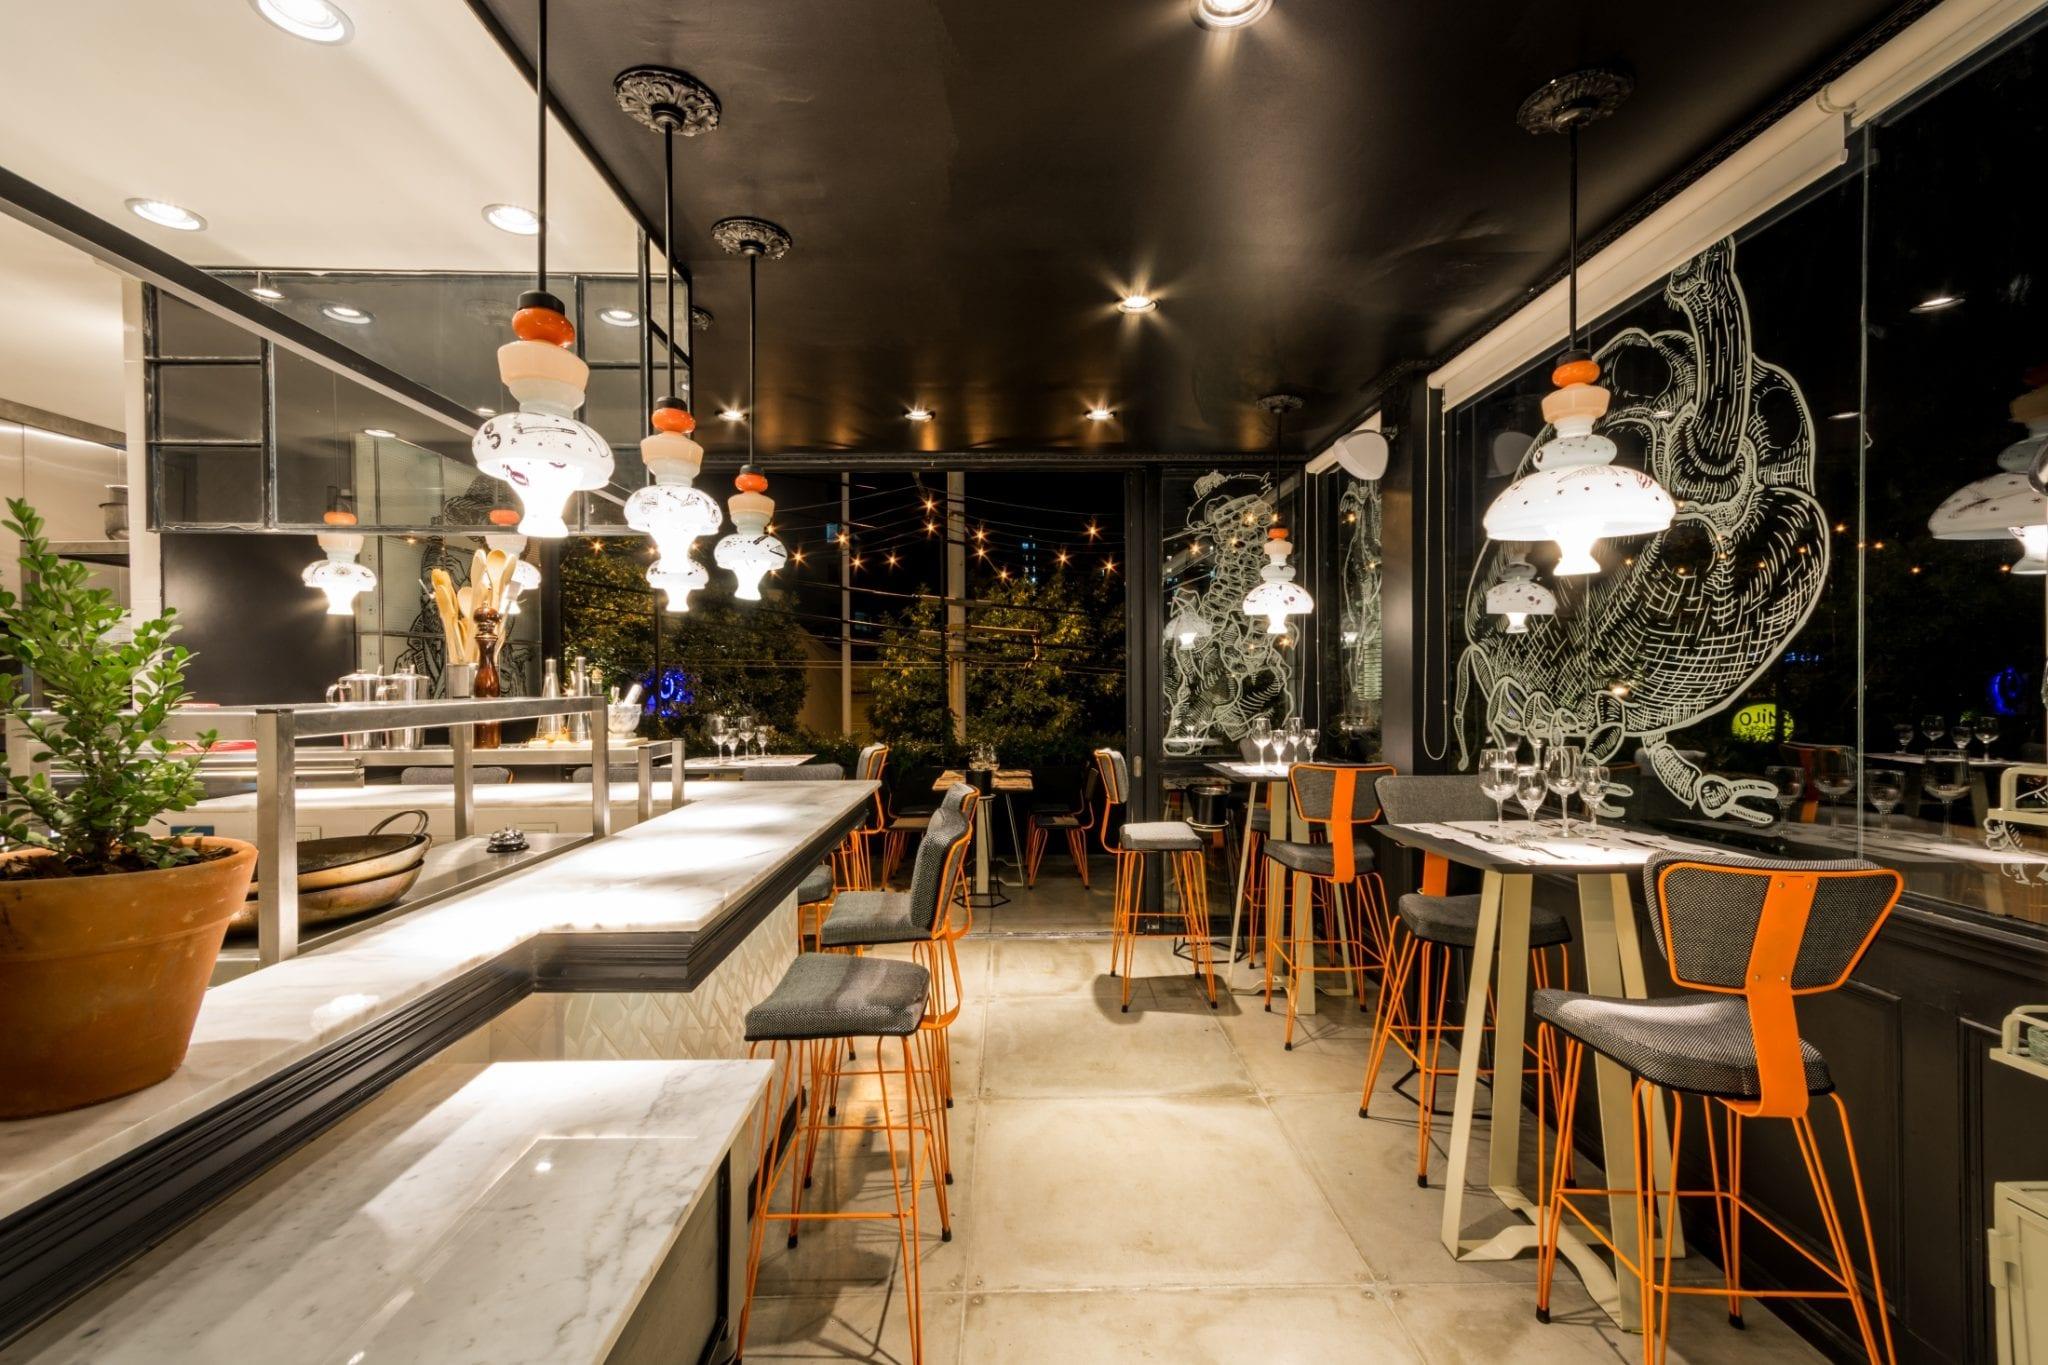 090317  -  Gordo Restoran ph G Viramonte-4458